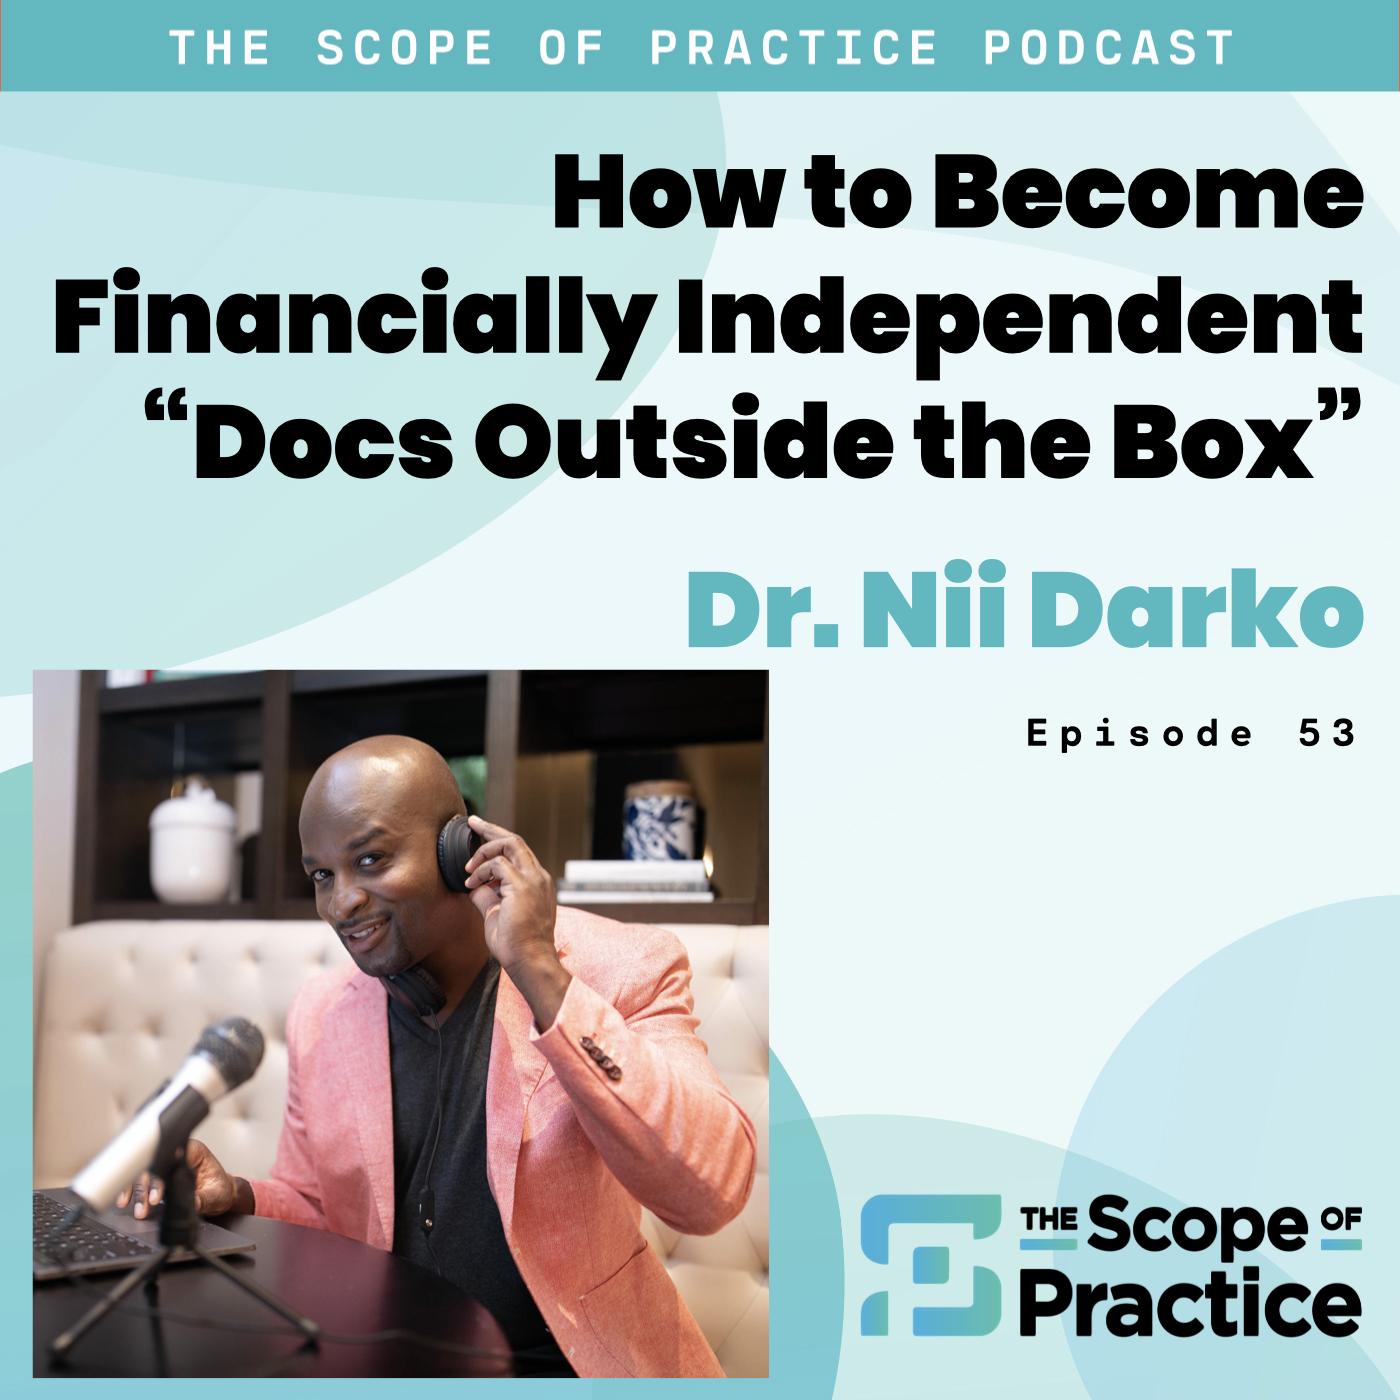 Dr. Nii Darko Docs Outside the Box